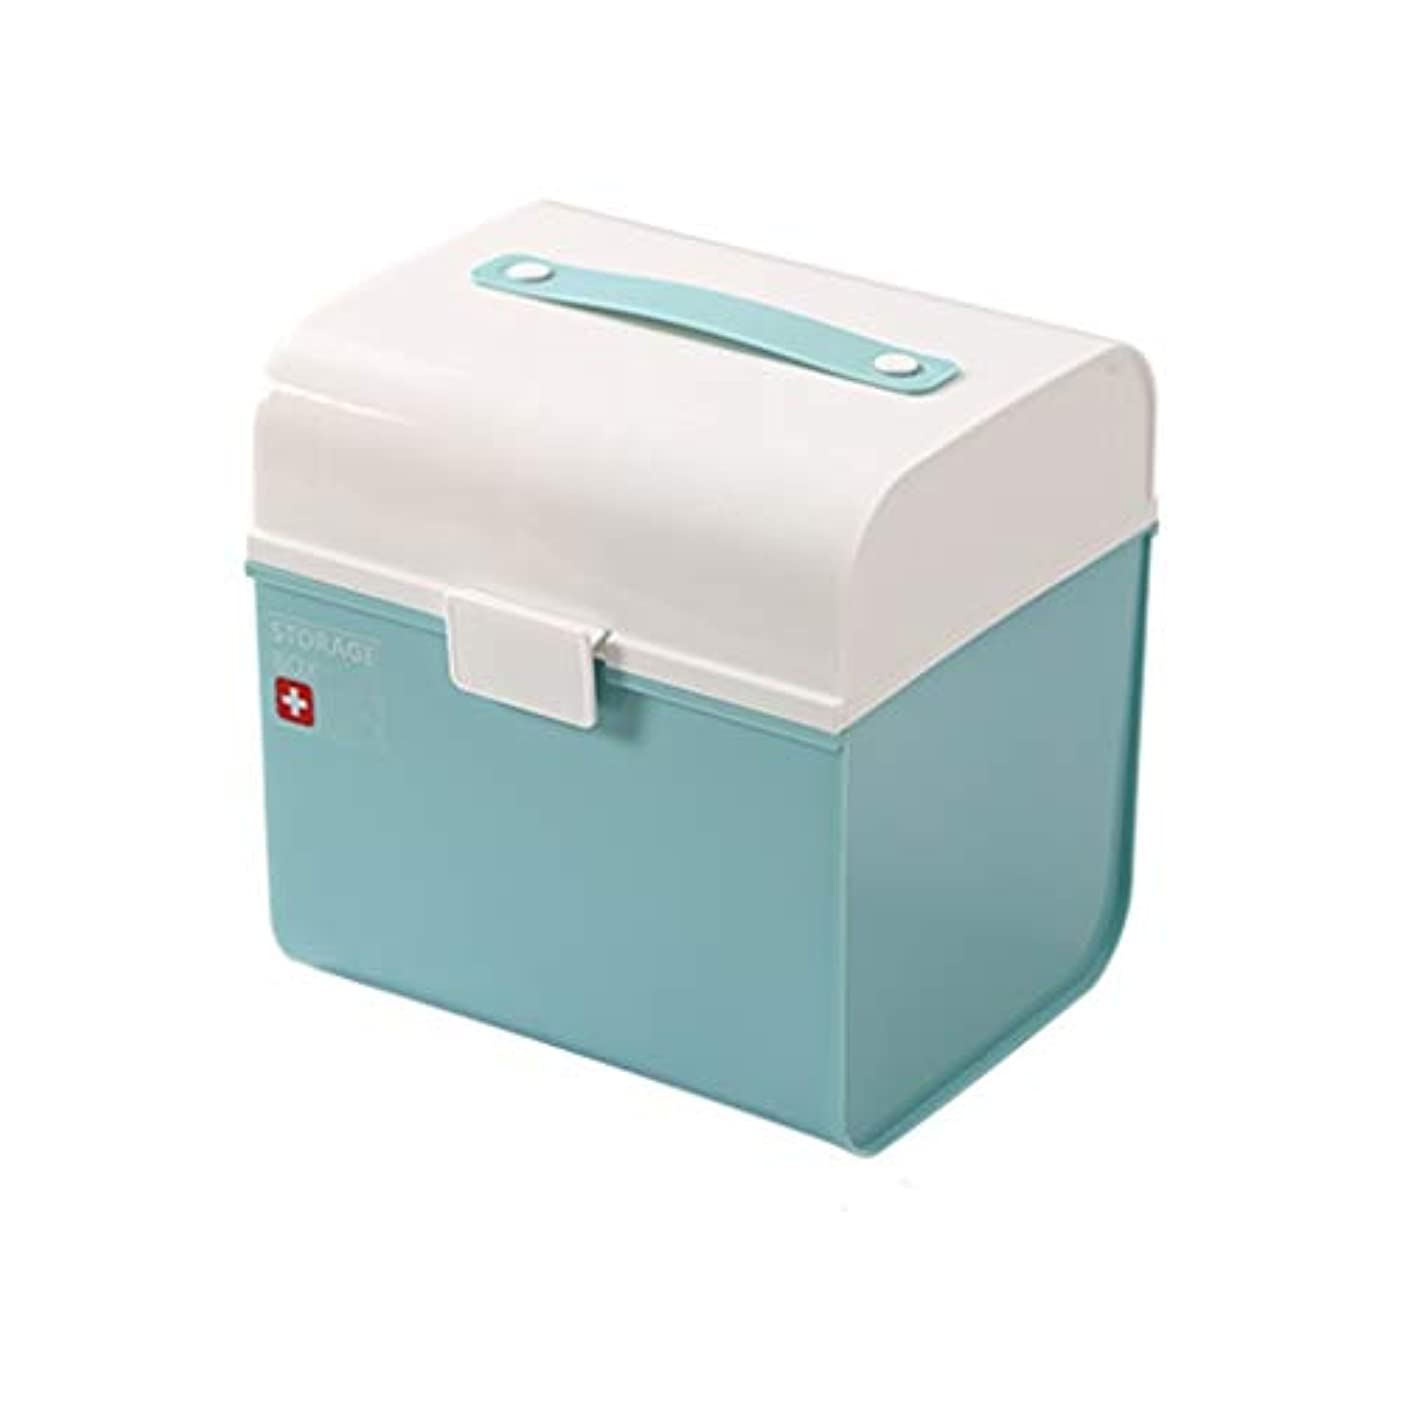 宇宙飛行士織る隙間IUYWL 家庭用薬箱、多層グリッド大容量救急箱、医師の訪問箱 (Color : Blue)